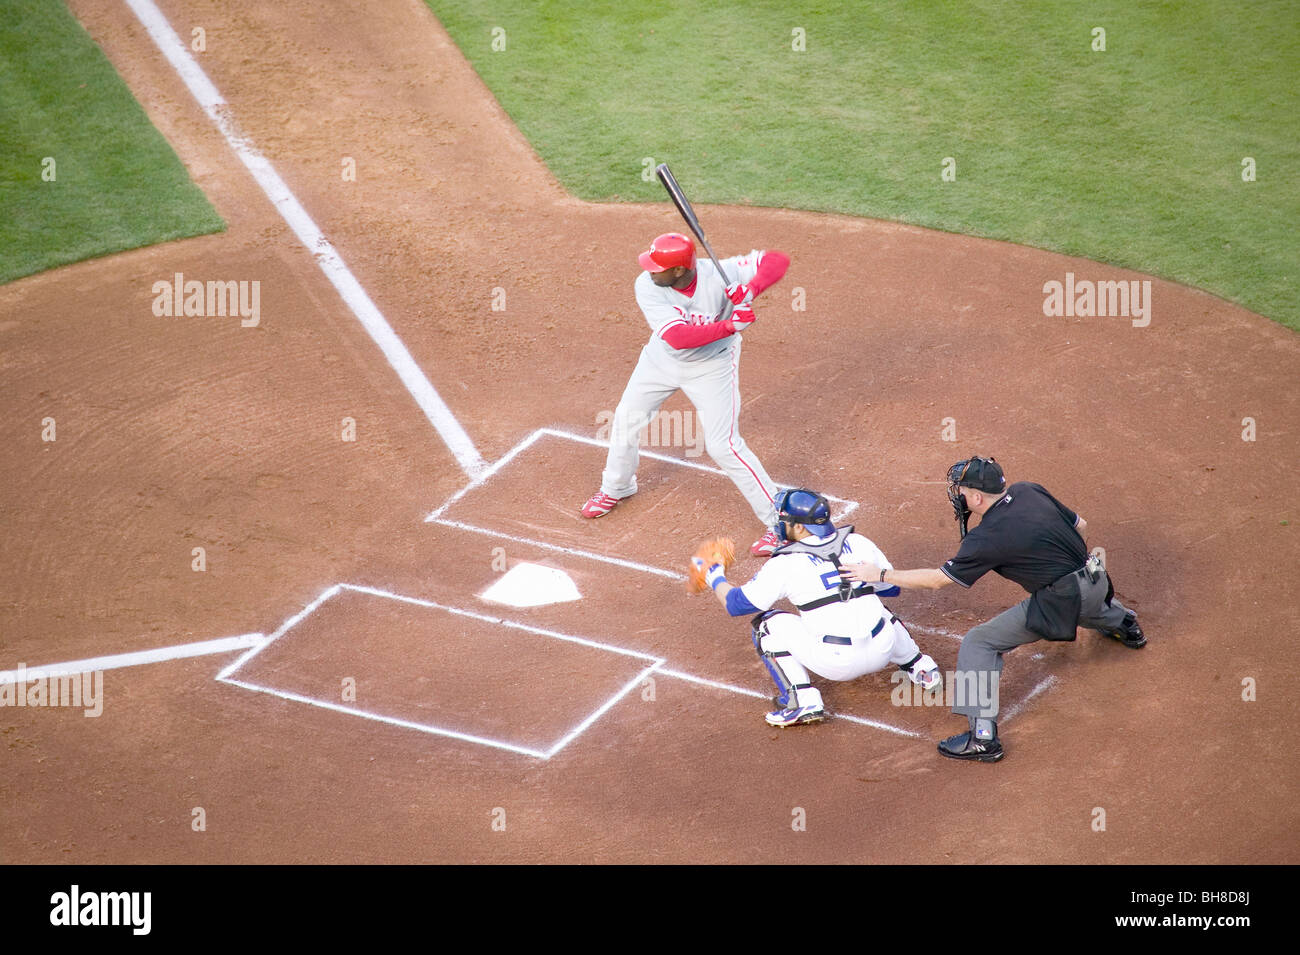 Philadelphia Phillies Ryan Howard, #6, left hand batter and National League Home Run and RBI Champion, Dodger Stadium - Stock Image